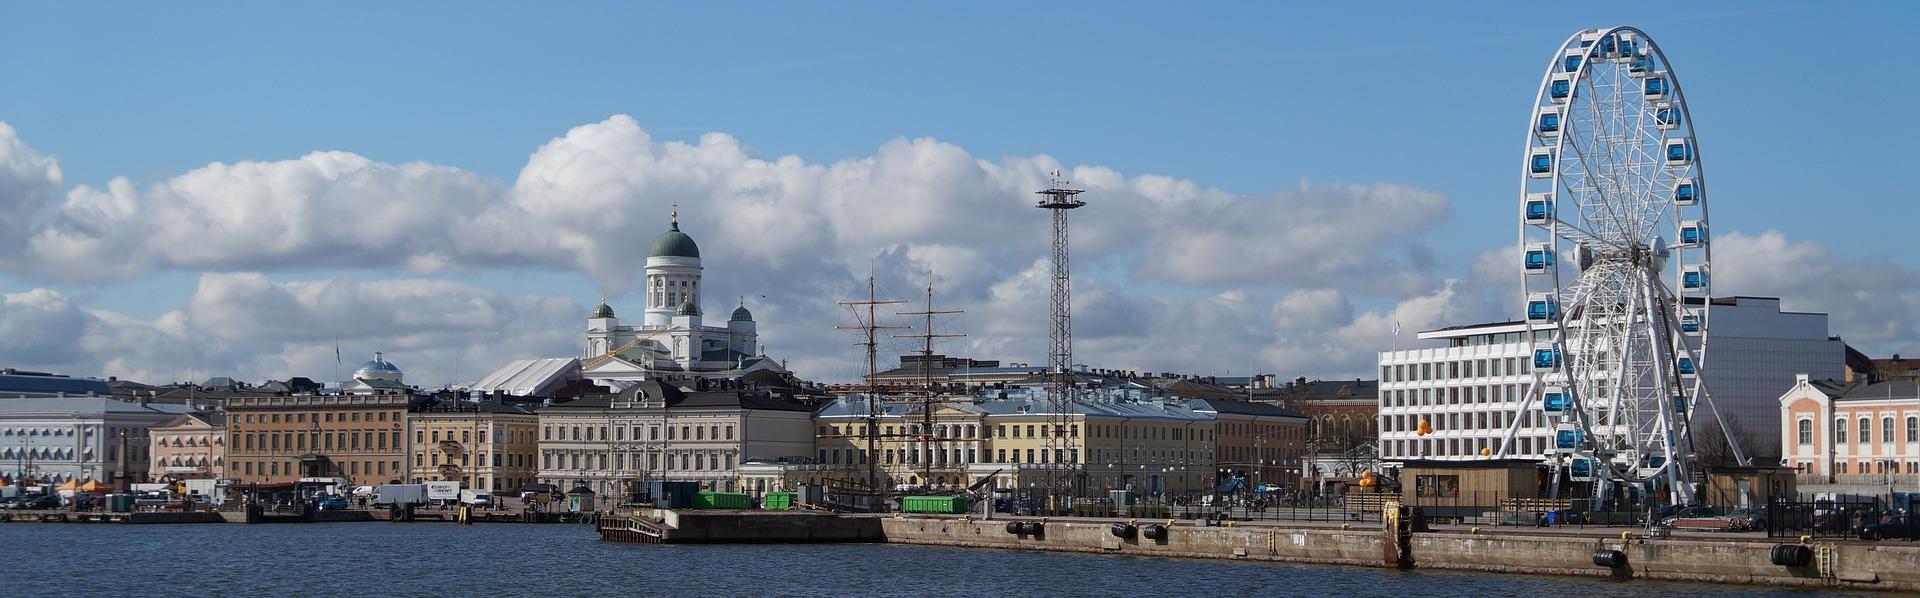 Autotransport Finnland Fahrzeugtransport